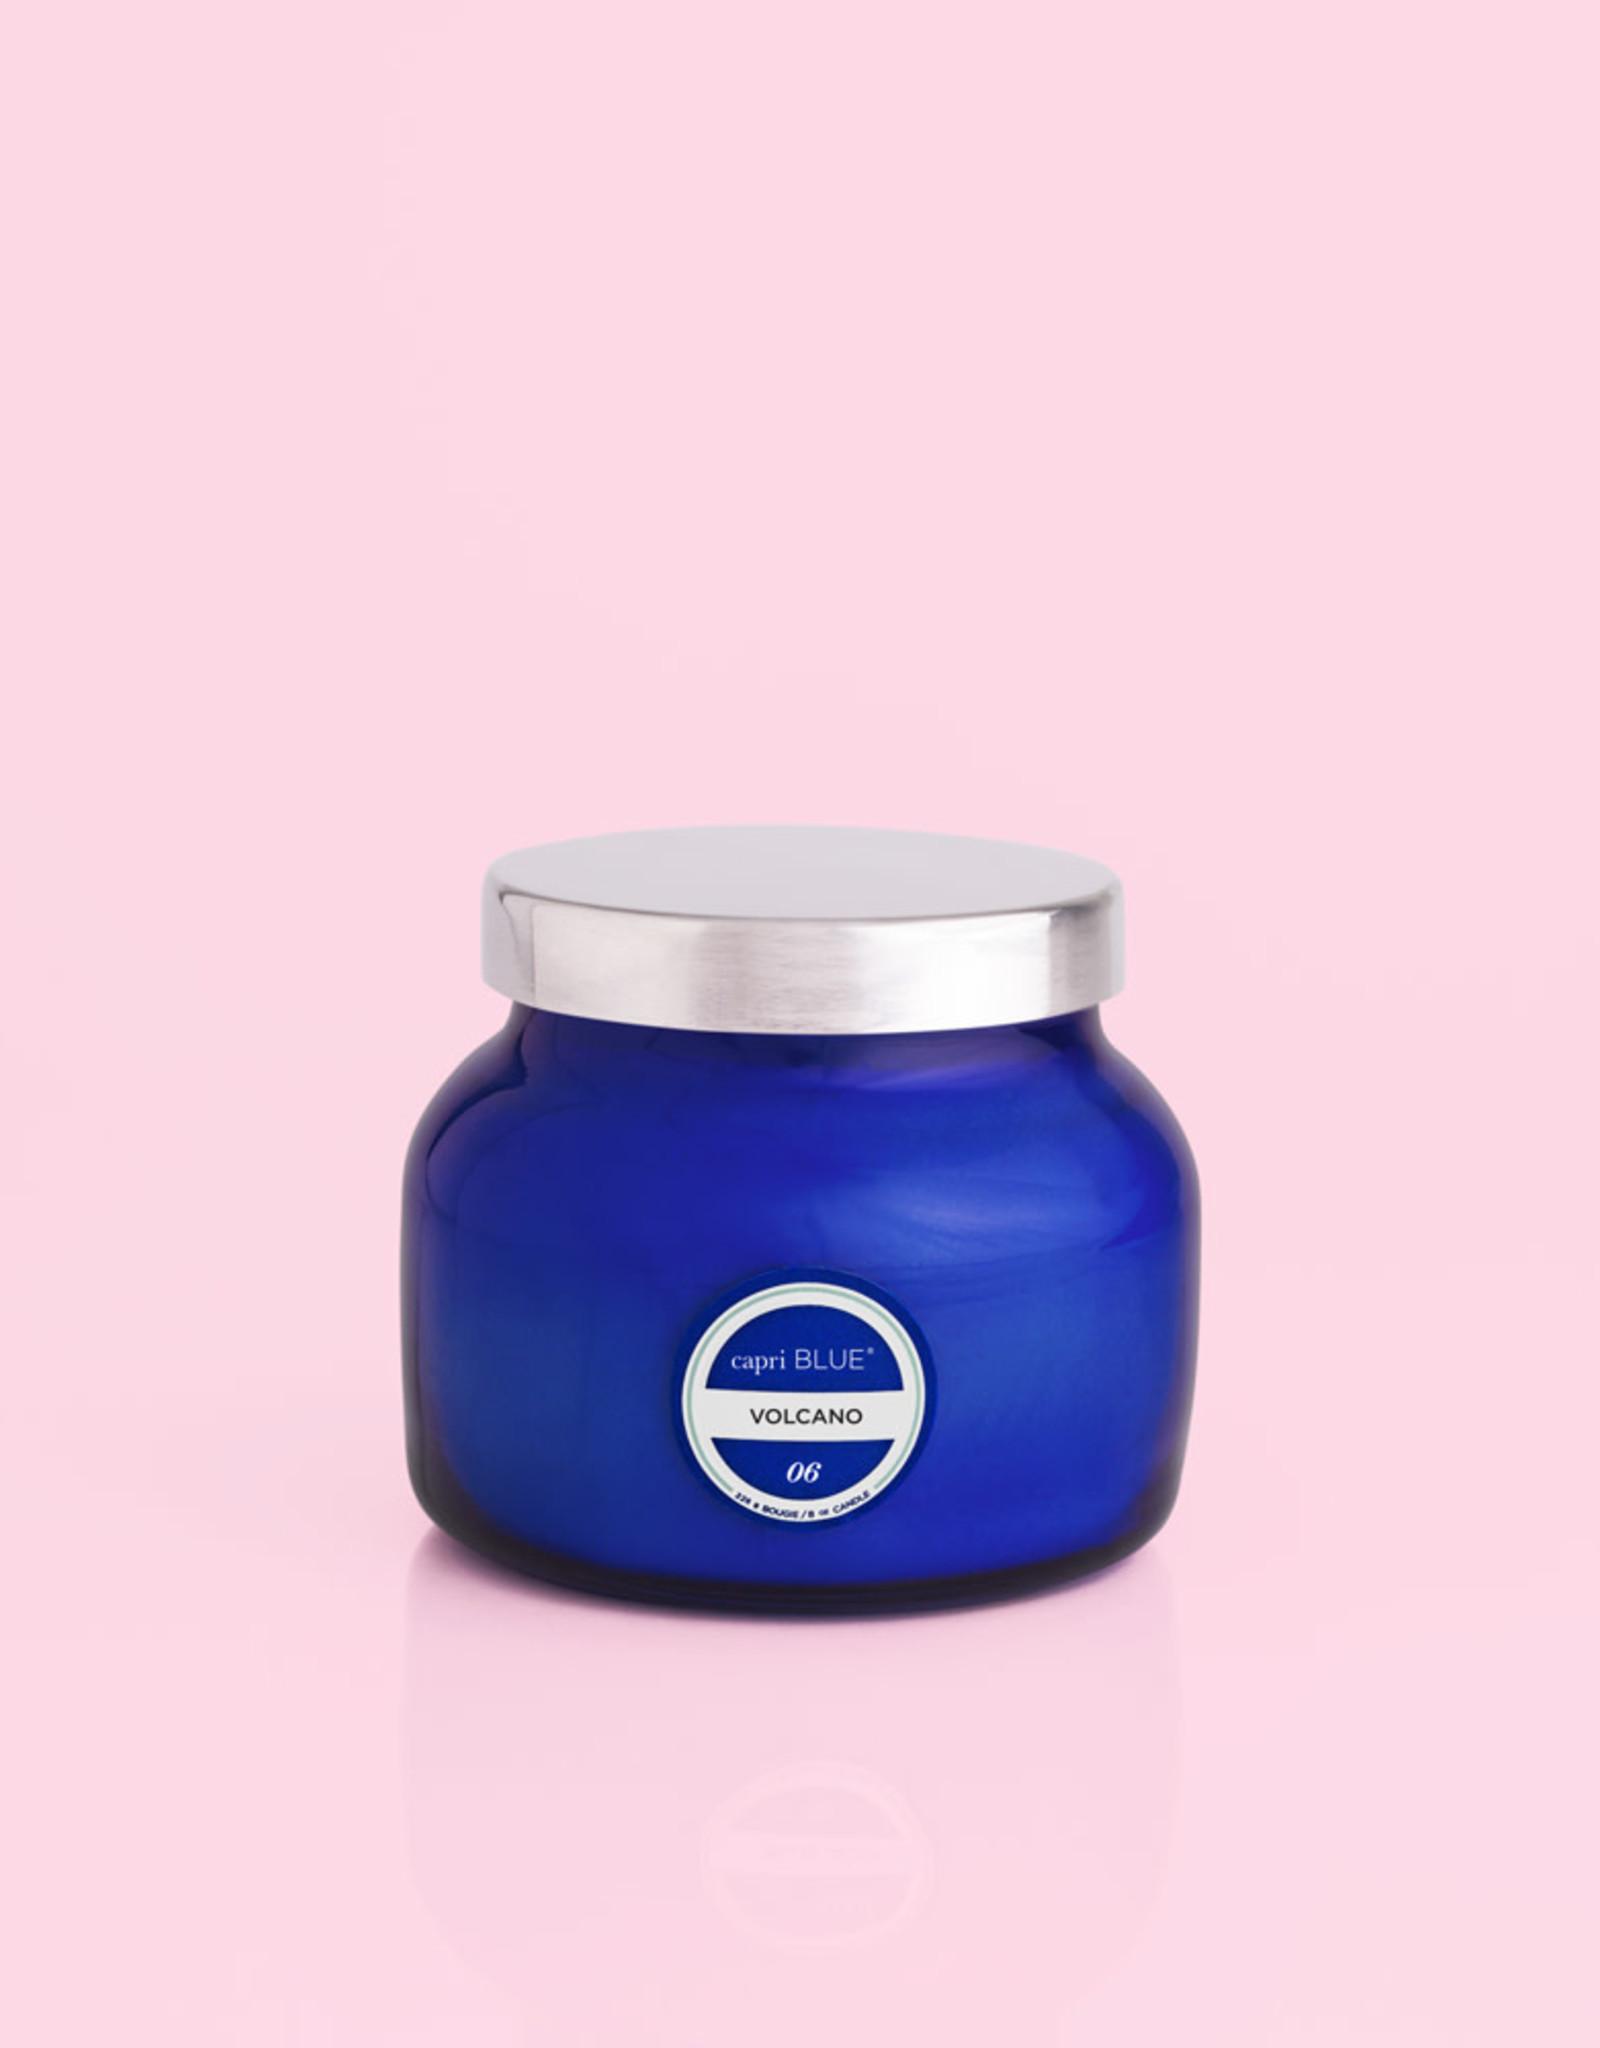 Capri Blue Volcano Candle - 8oz